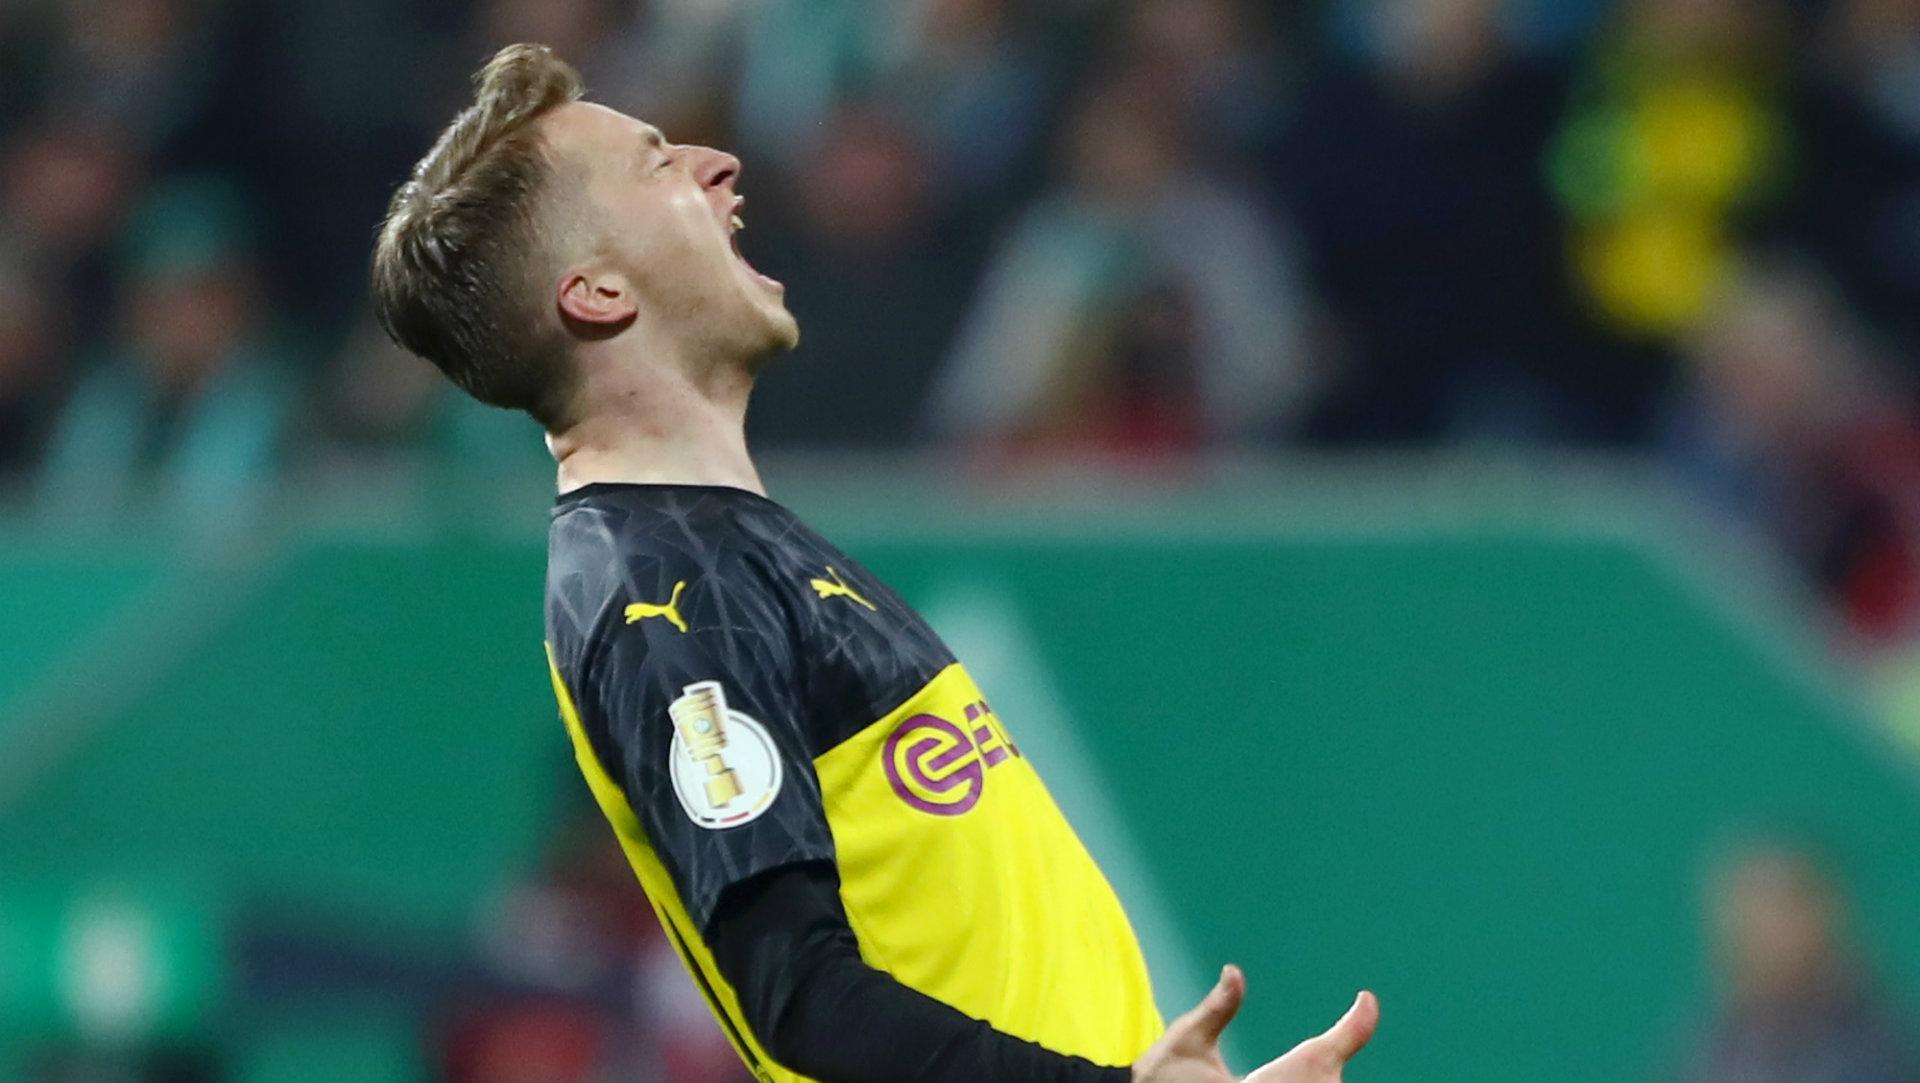 Borussia Dortmund, Reus out quattro settimane: salta il PSG